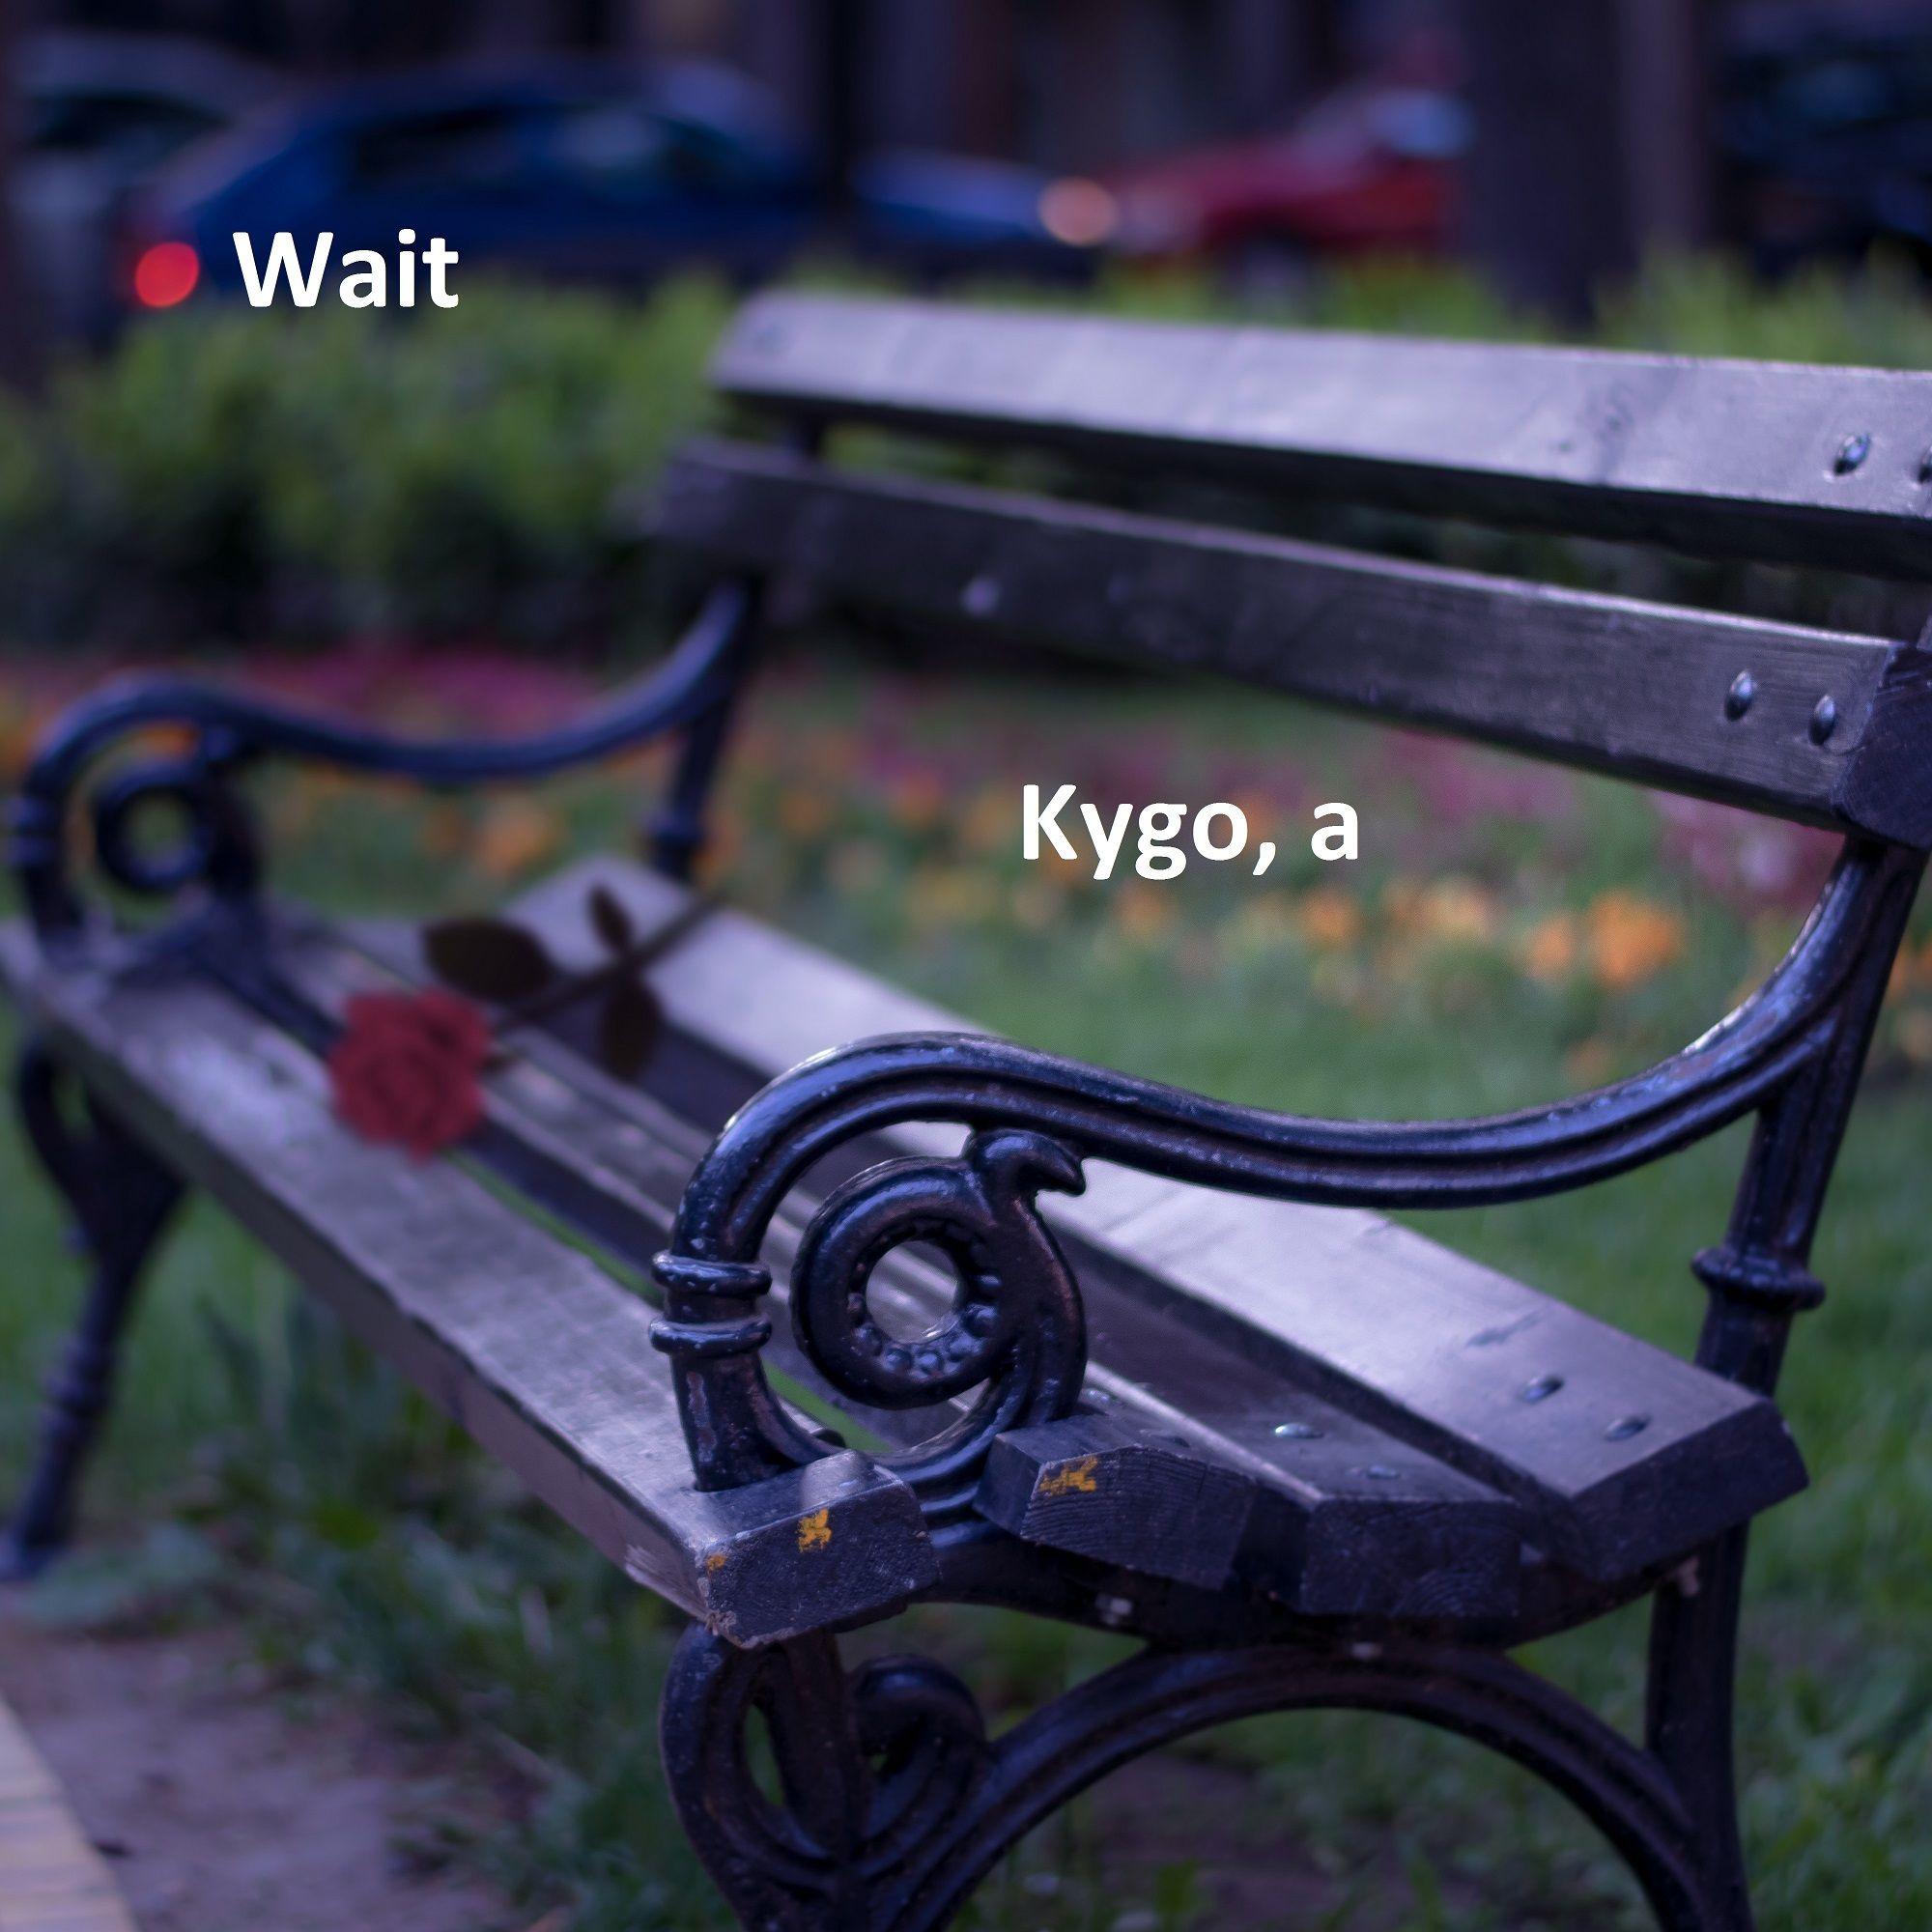 Kygo, a